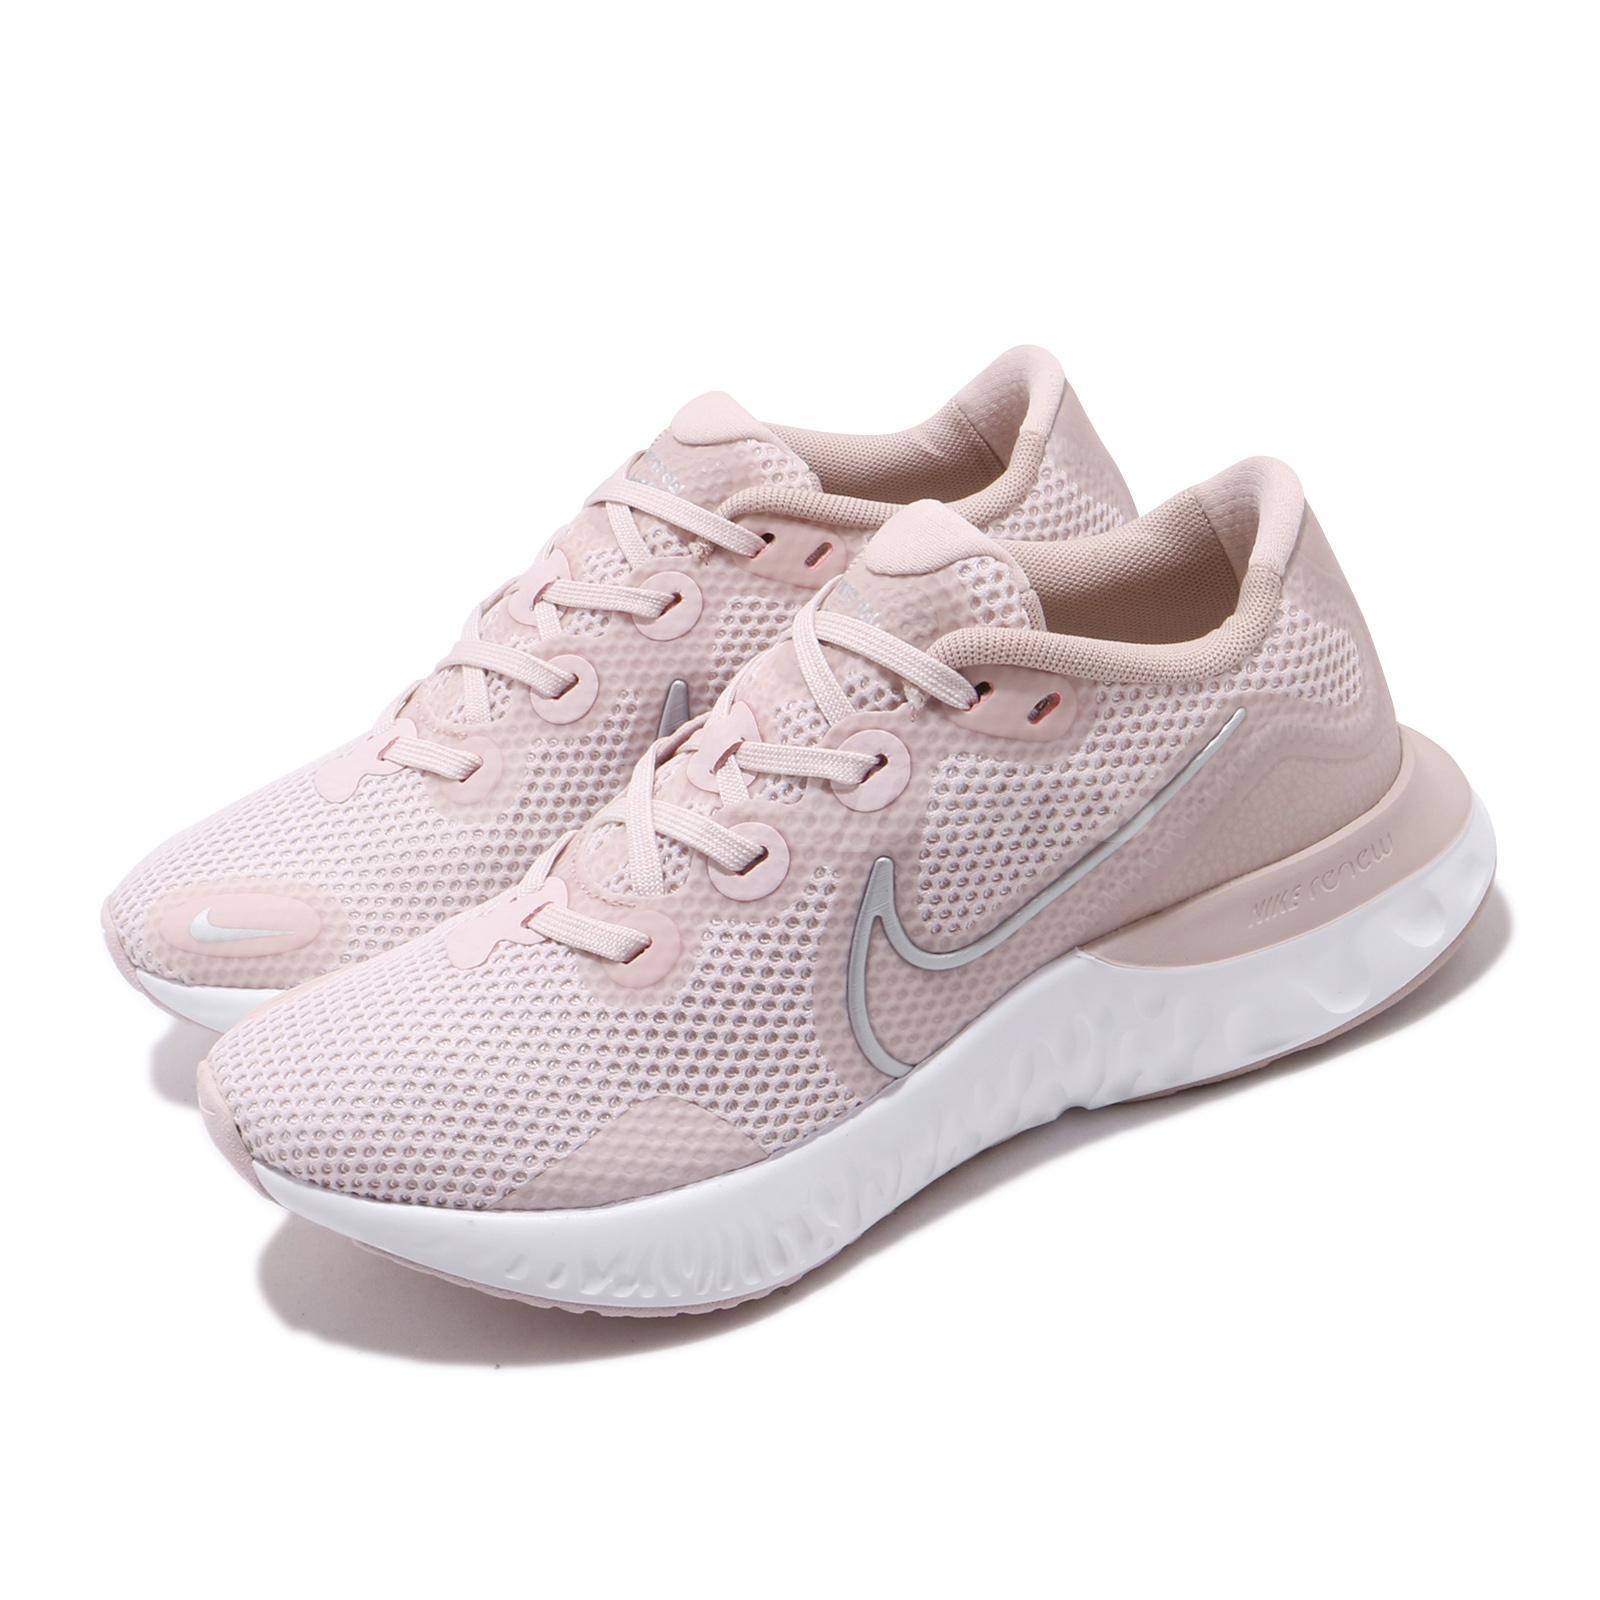 Nike Wmns Renew Run Barely Rose Pink